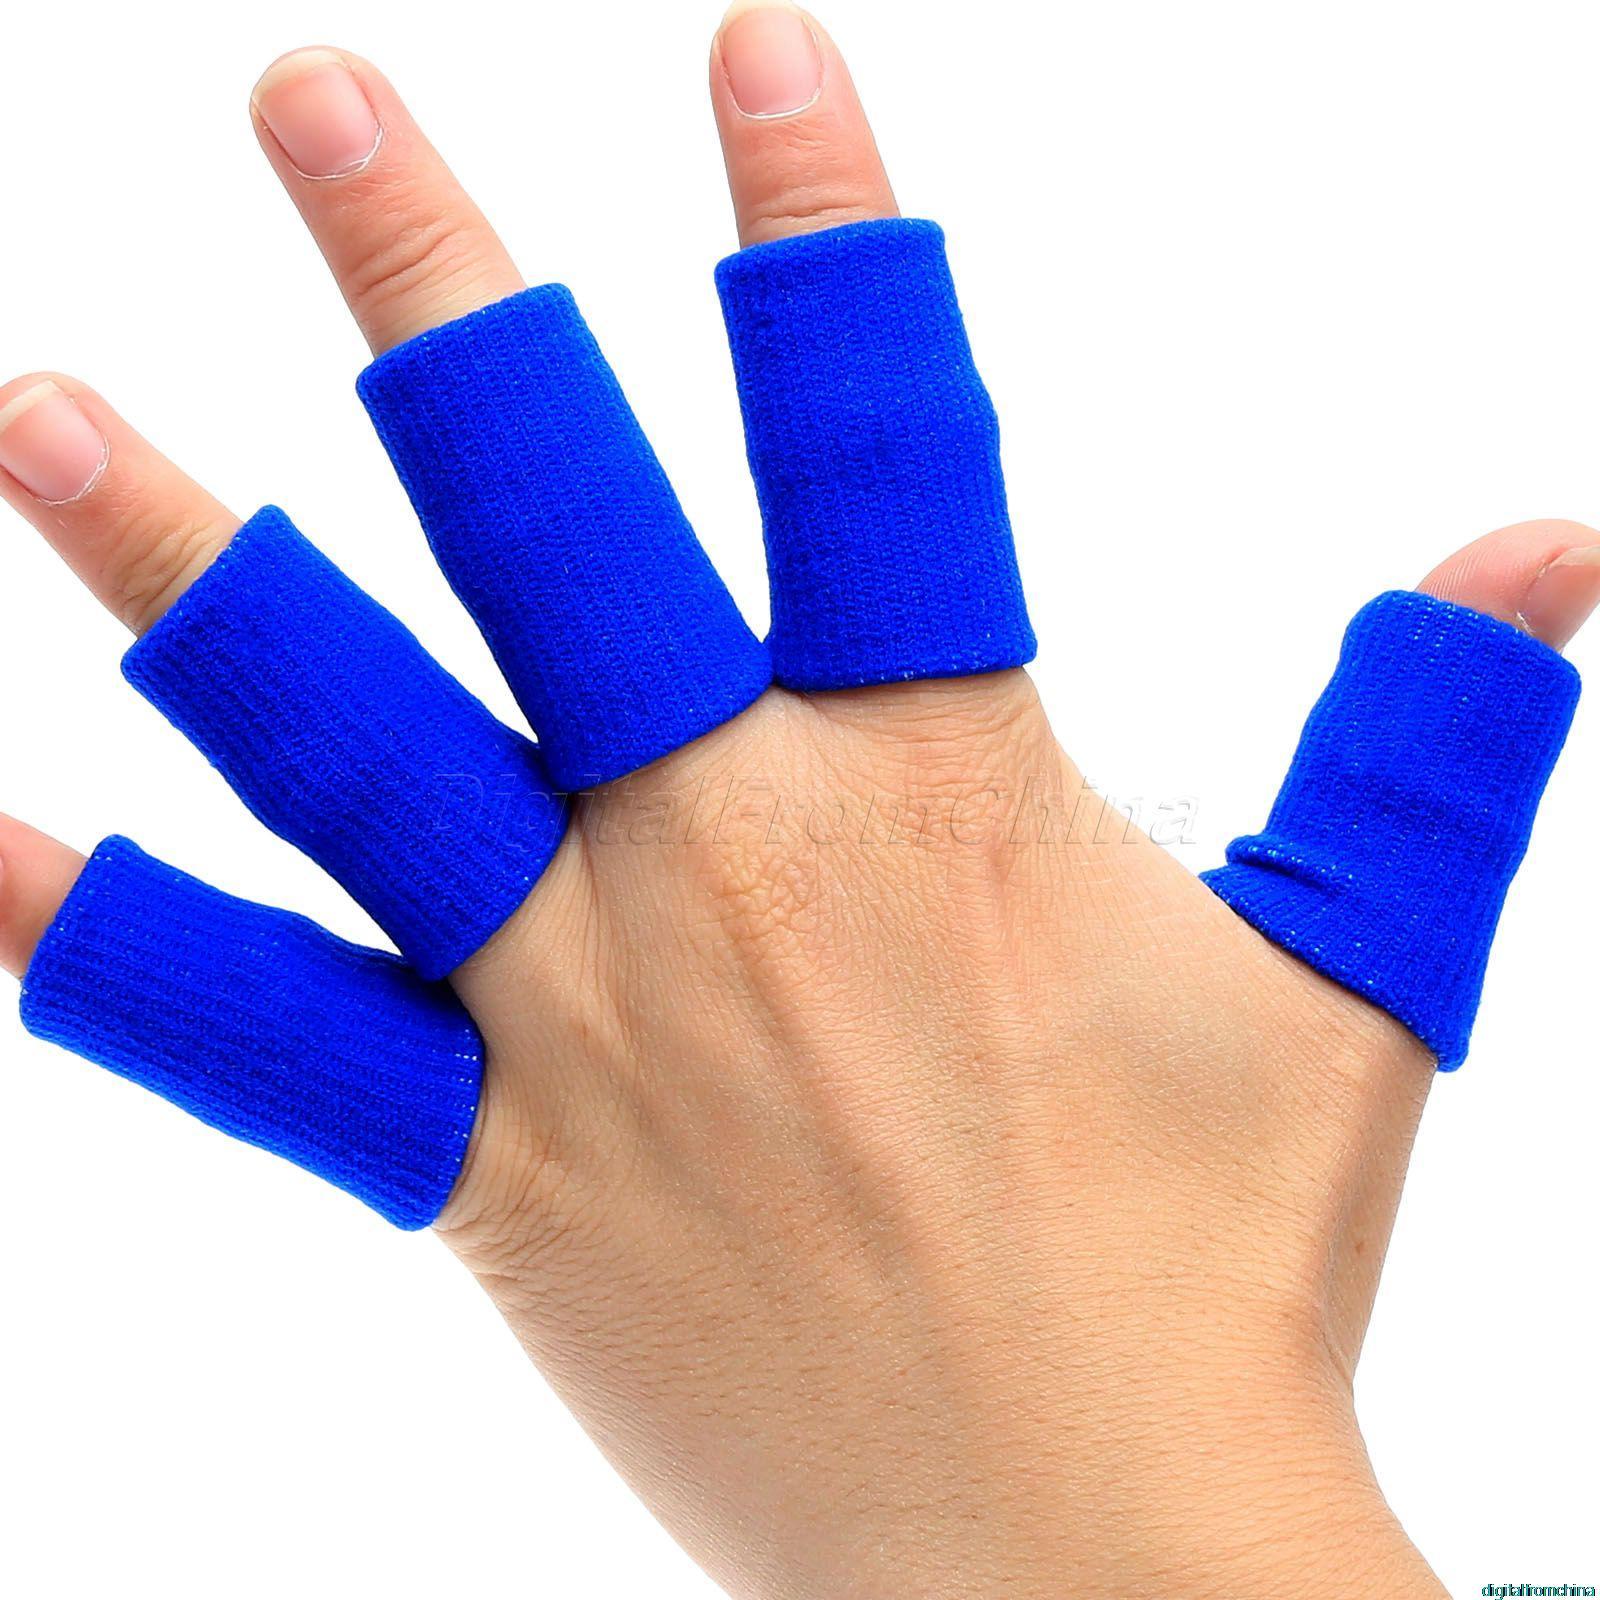 10pcs/set Sport Finger Splint Guard Bands Bandage Support Wrap Basketball Volleyball Football Fingerstall Sleeve Caps Protector<br><br>Aliexpress